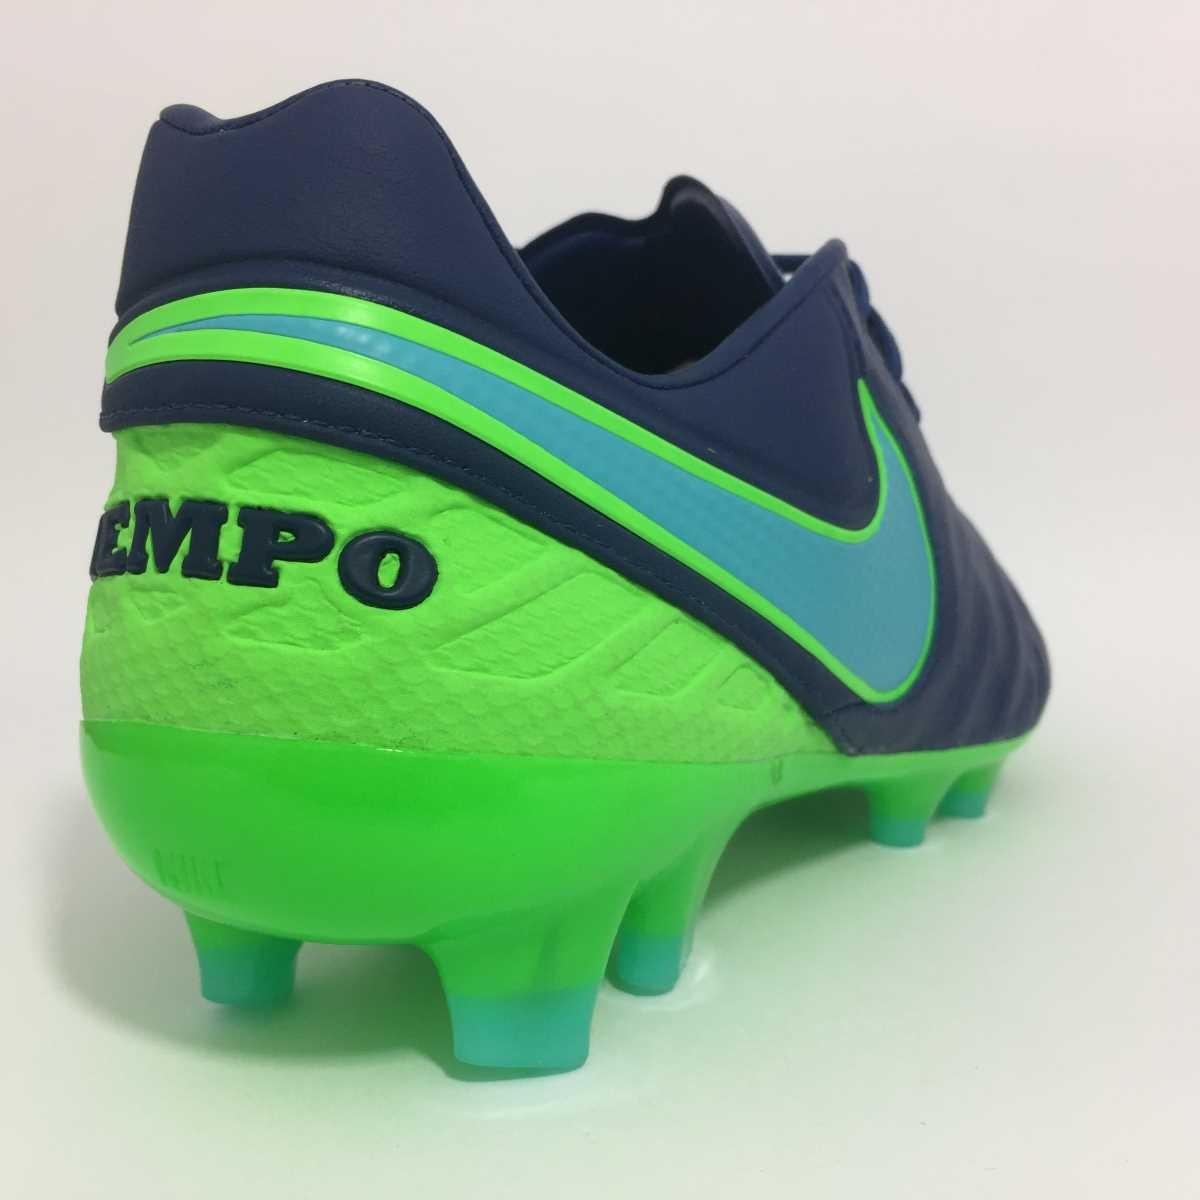 ed0996ac0747b Chuteira Nike Tiempo Legend Vi Varias Cores Profissional - R  499